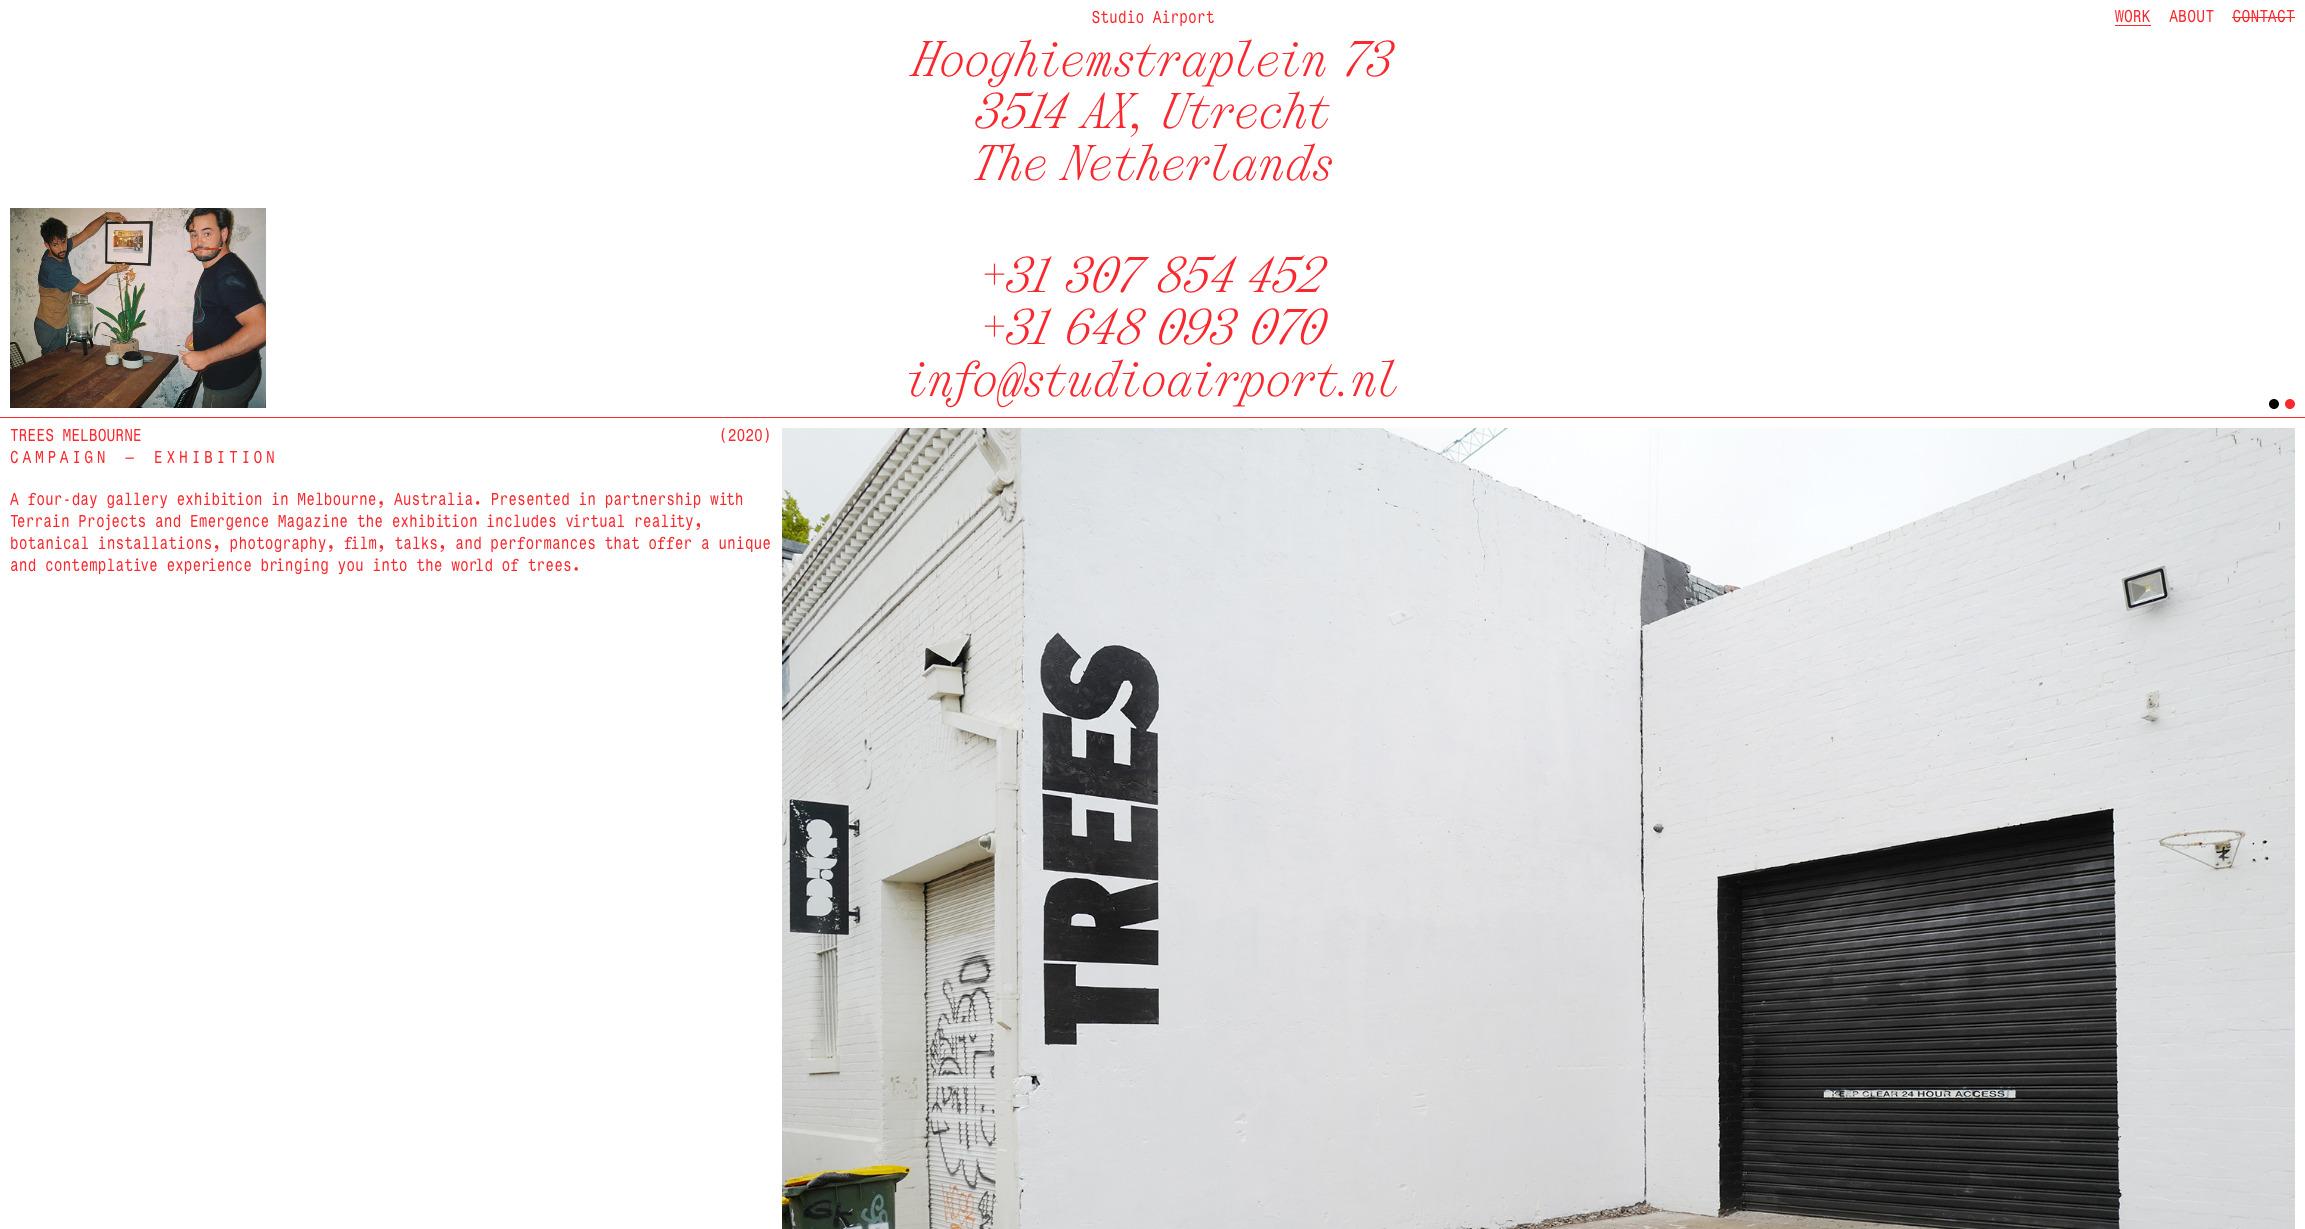 images/1.jpg